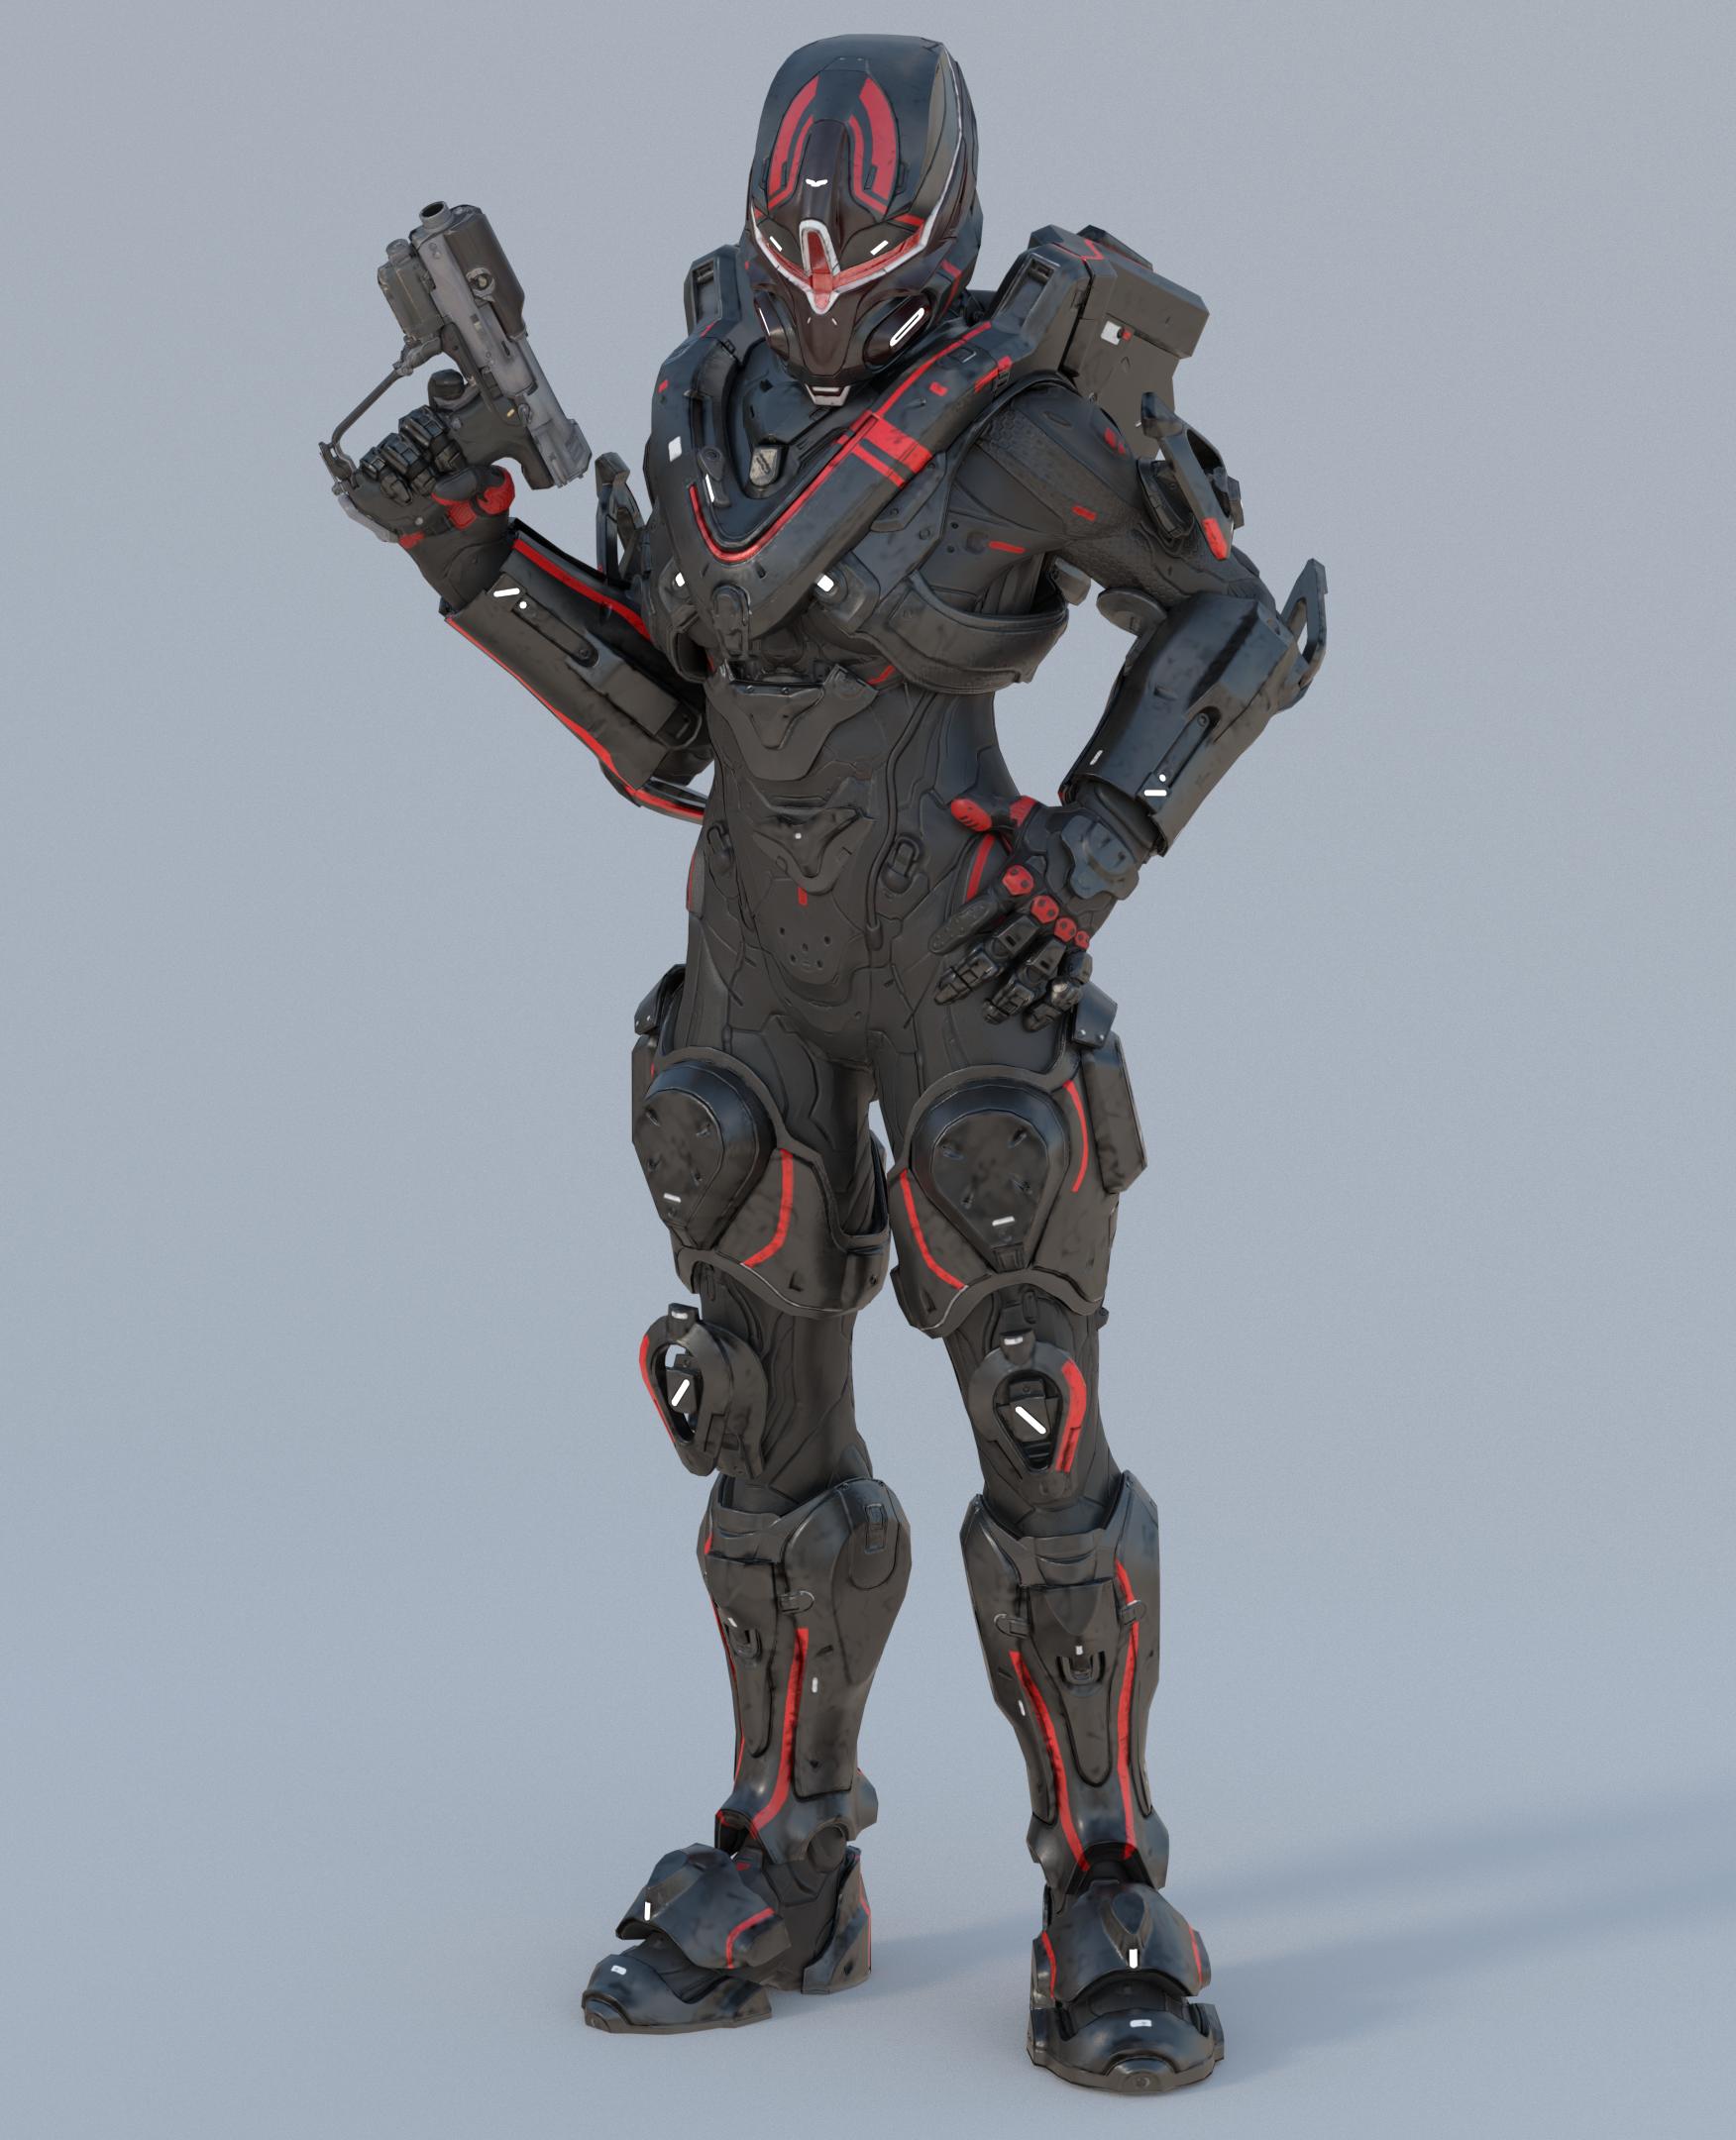 Spartan Ash 098 by UltimateKaiju on DeviantArt | Halo